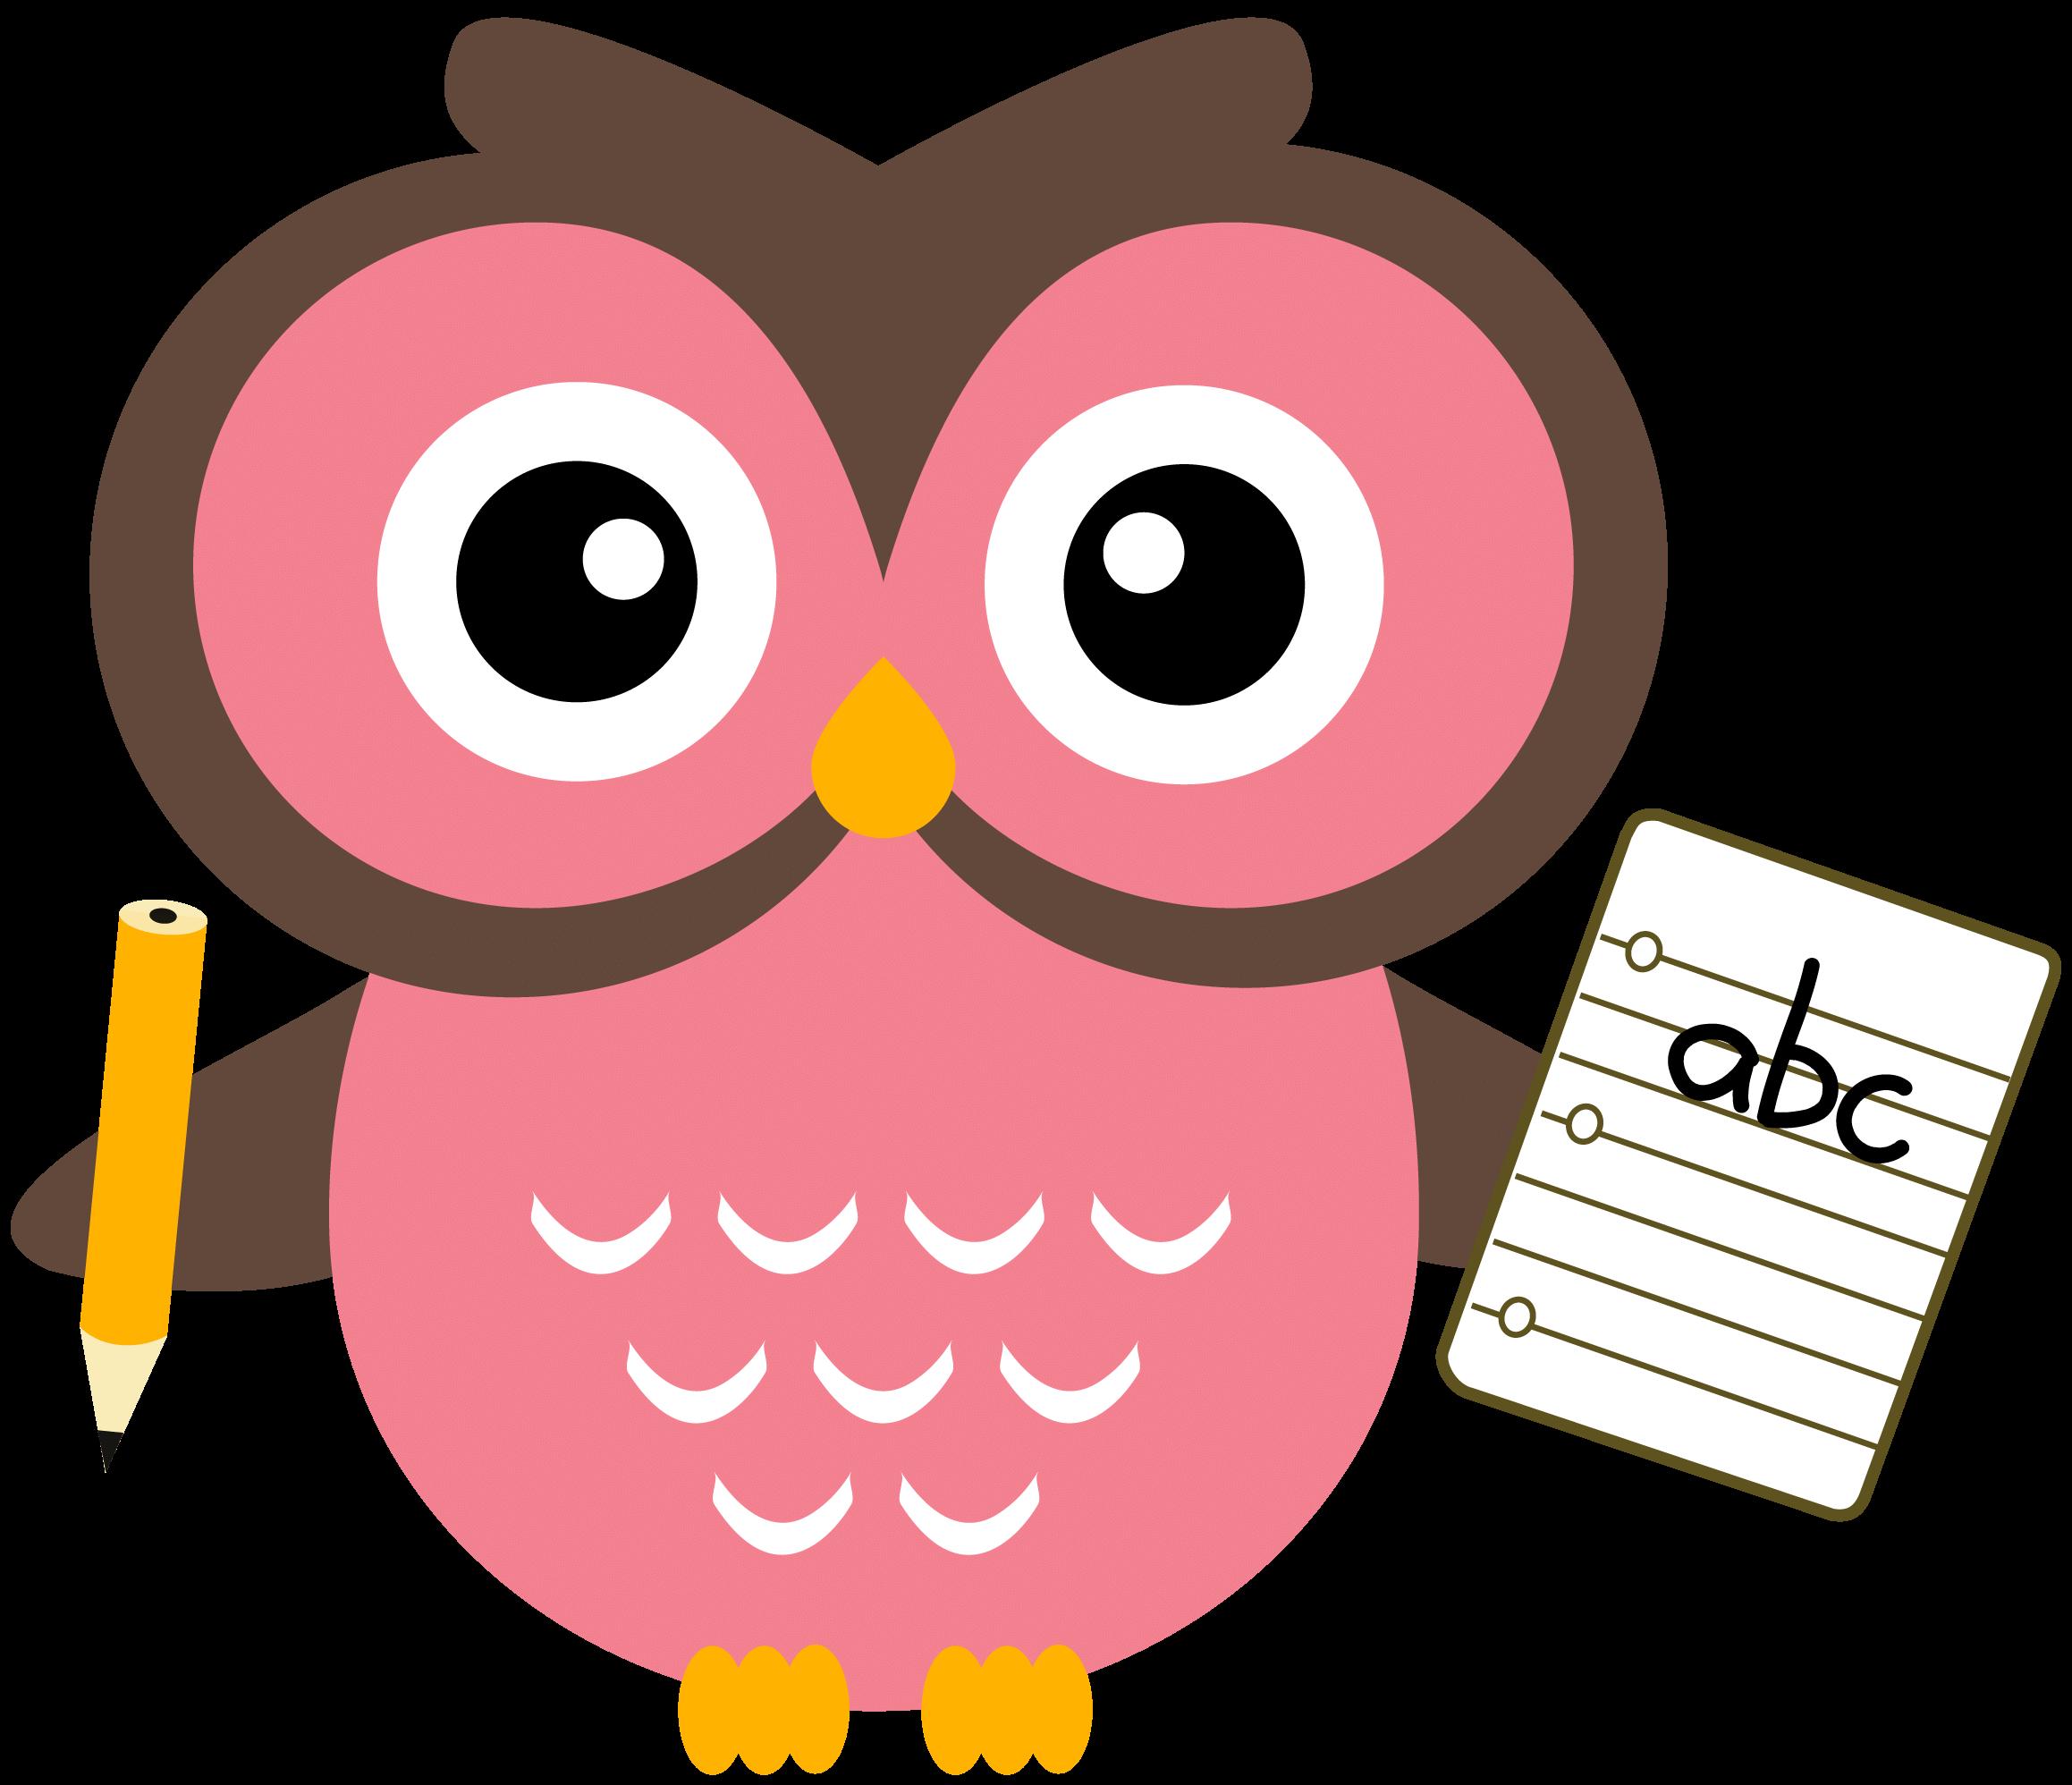 image free download Writer clipart owl. Test jokingart com